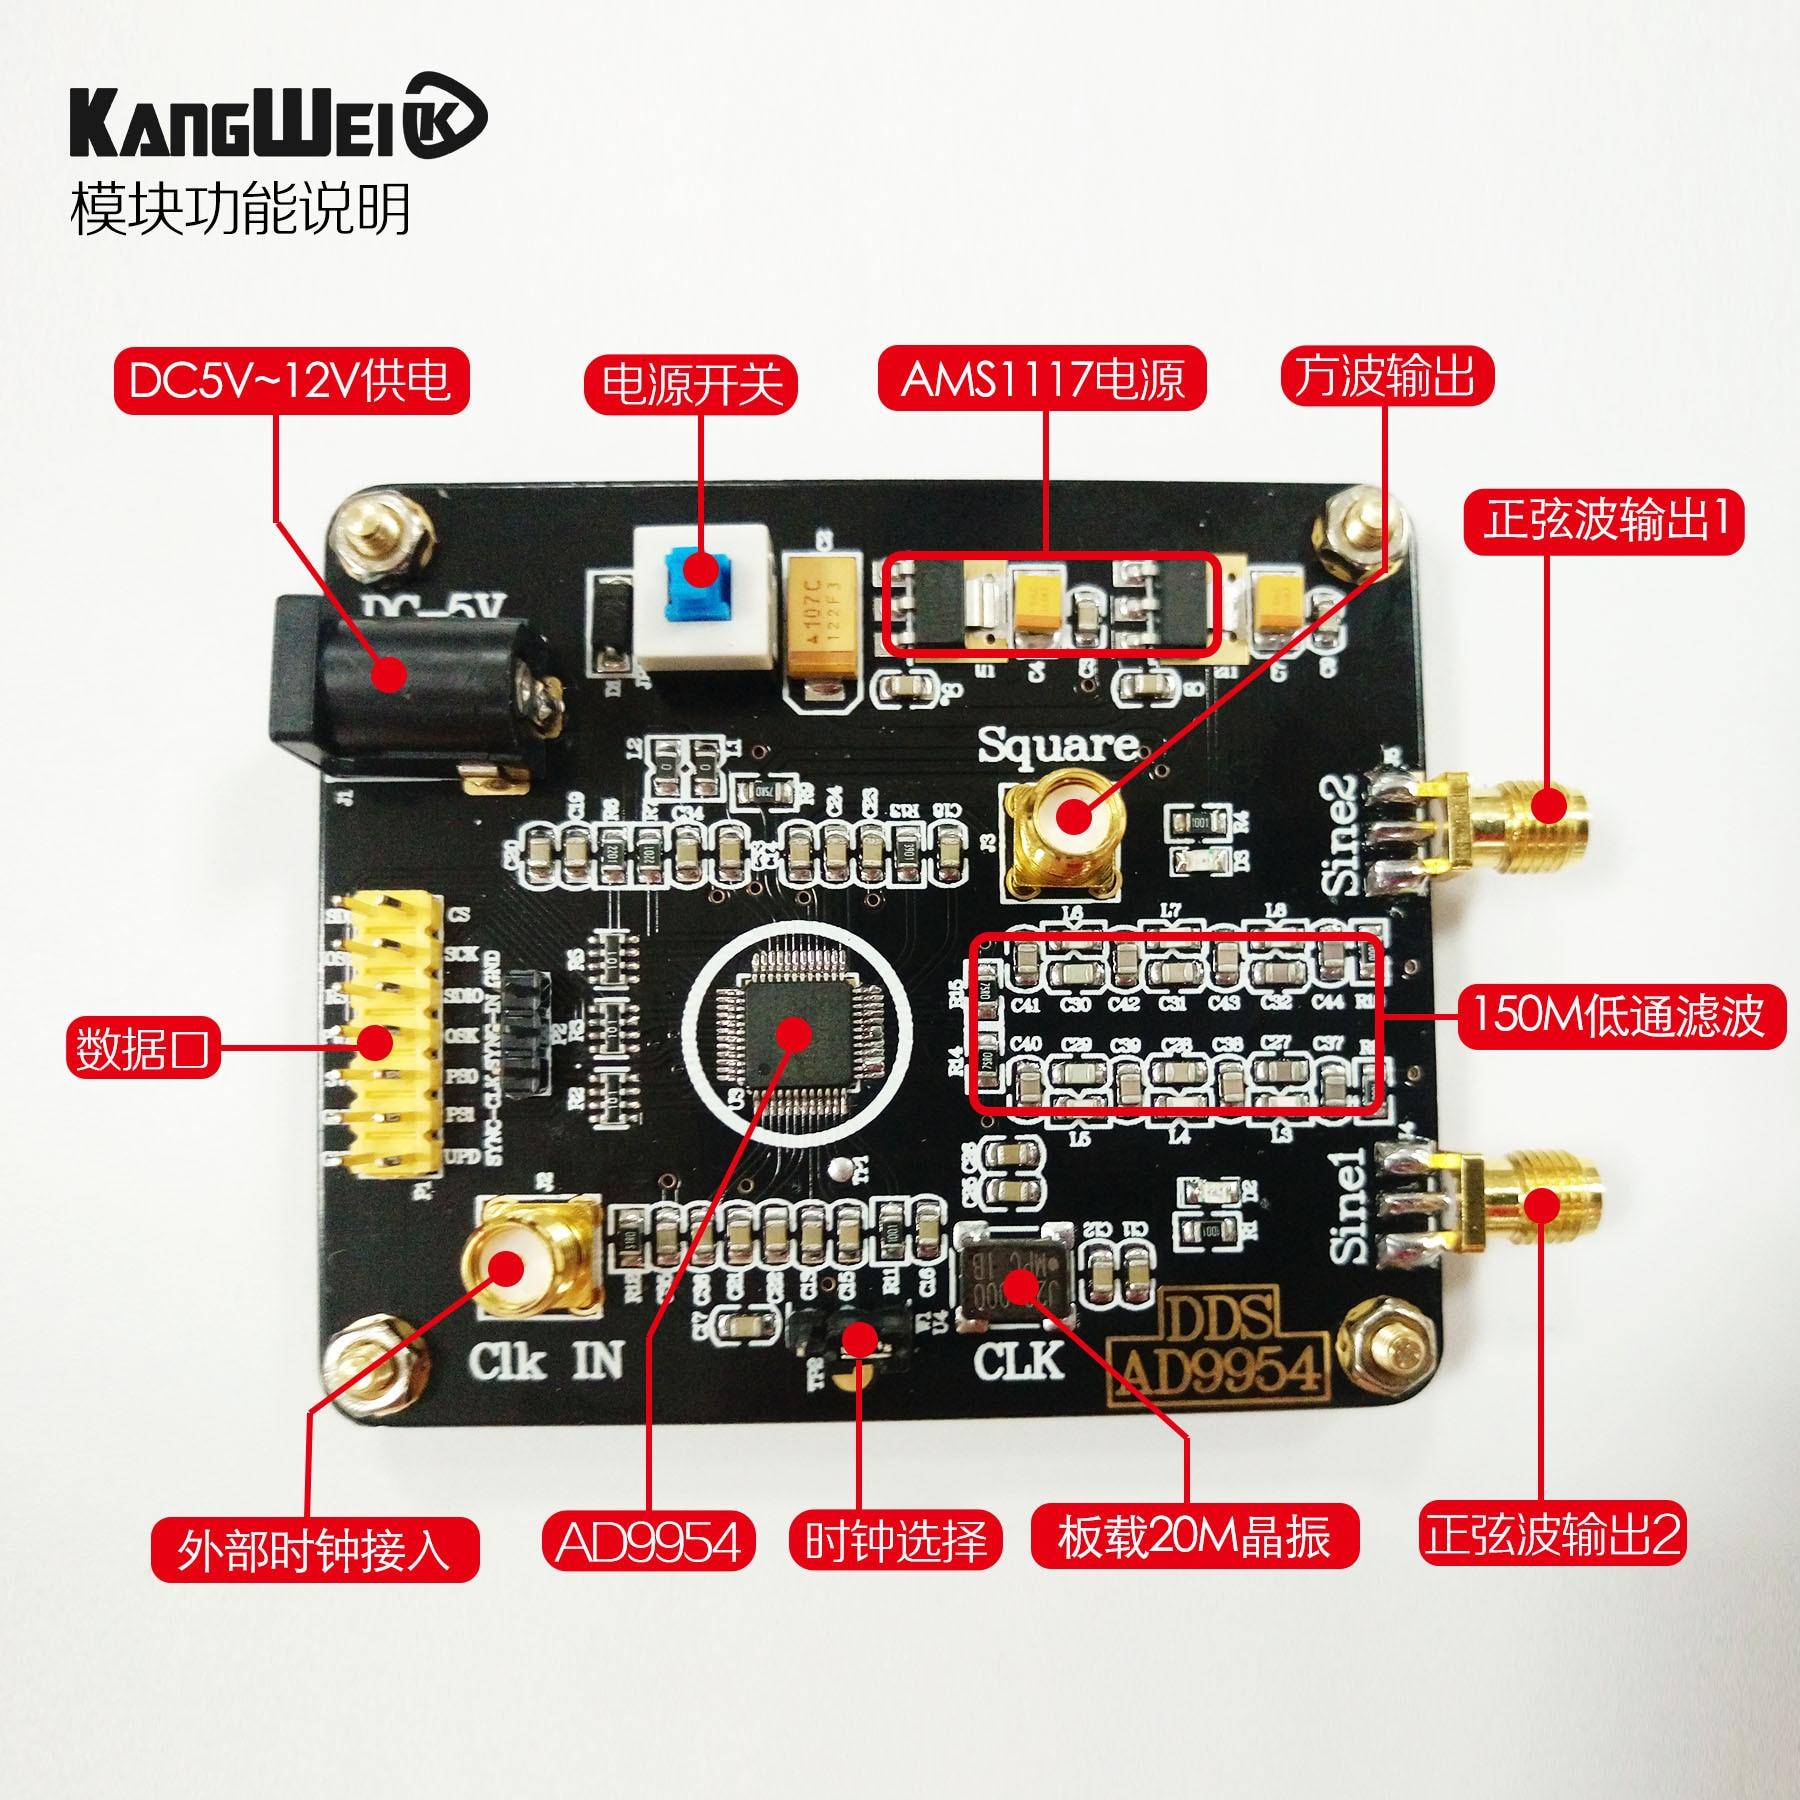 AD9954 DDS Signal Generator Module Sinusoidal Square Wave RF Signal Source 400M Main Frequency Development Board